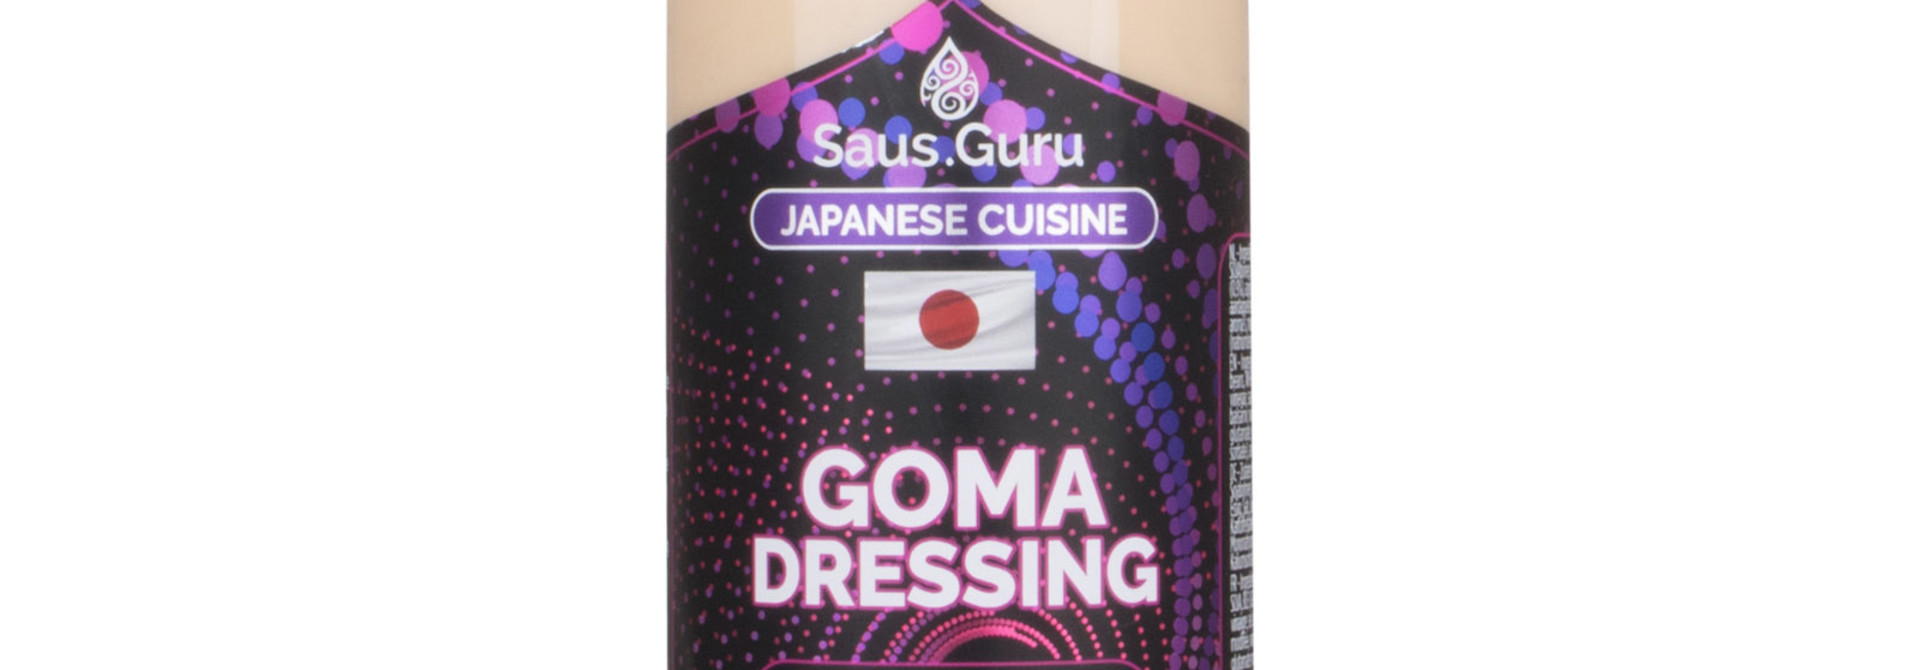 Saus.Guru's Goma Dressing